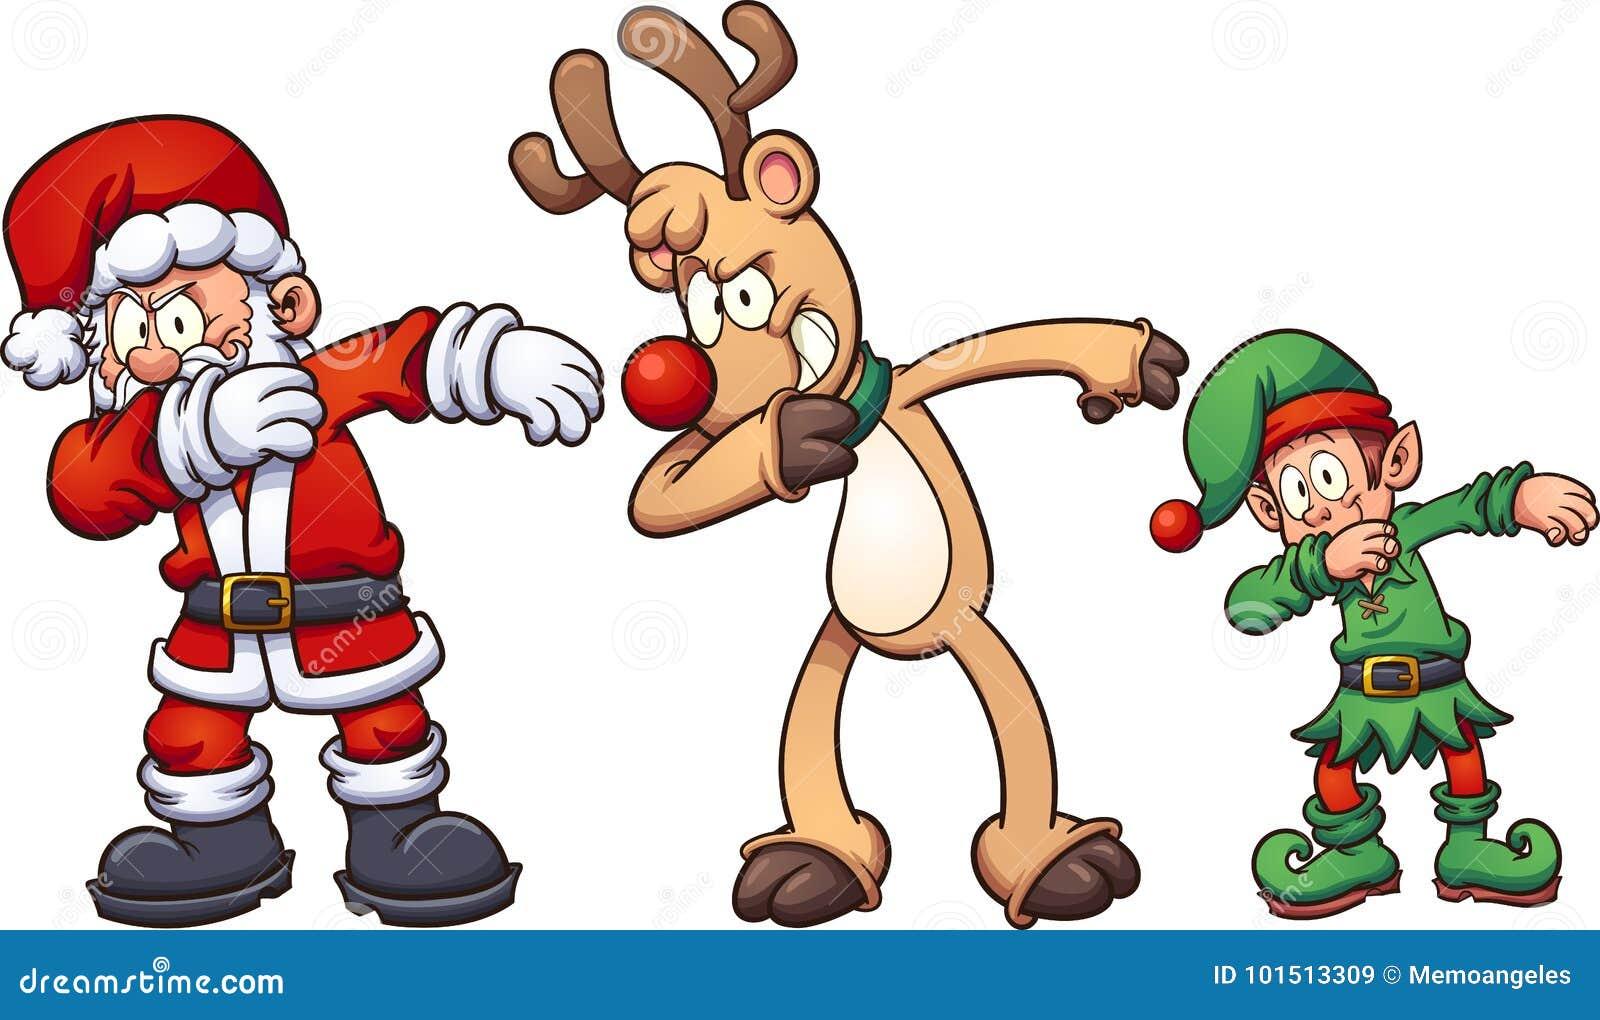 Cartoon Characters Dabbing : Dabbing cartoons illustrations vector stock images